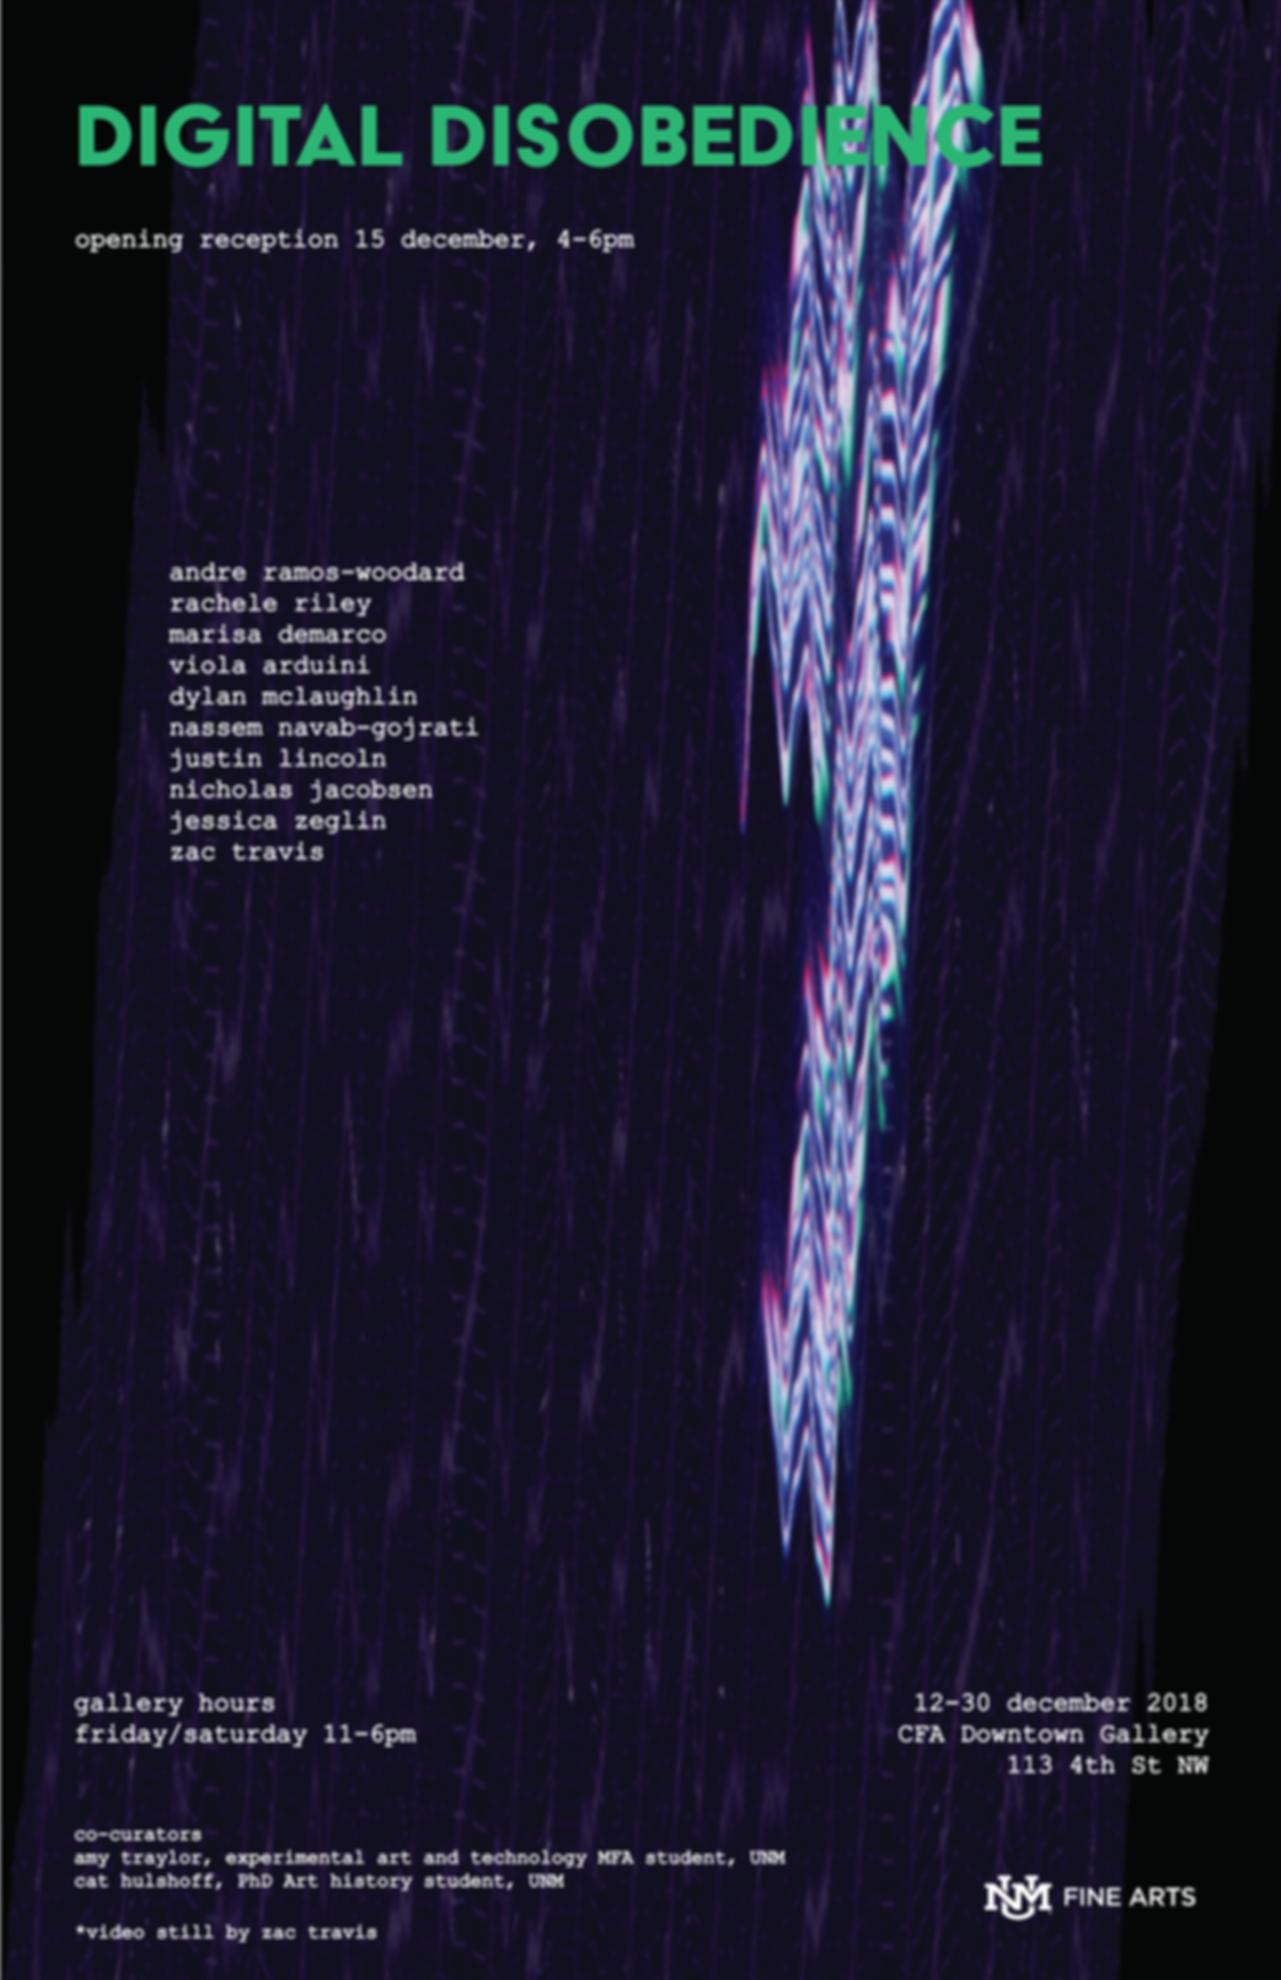 CFA Digital Disobendience poster.png